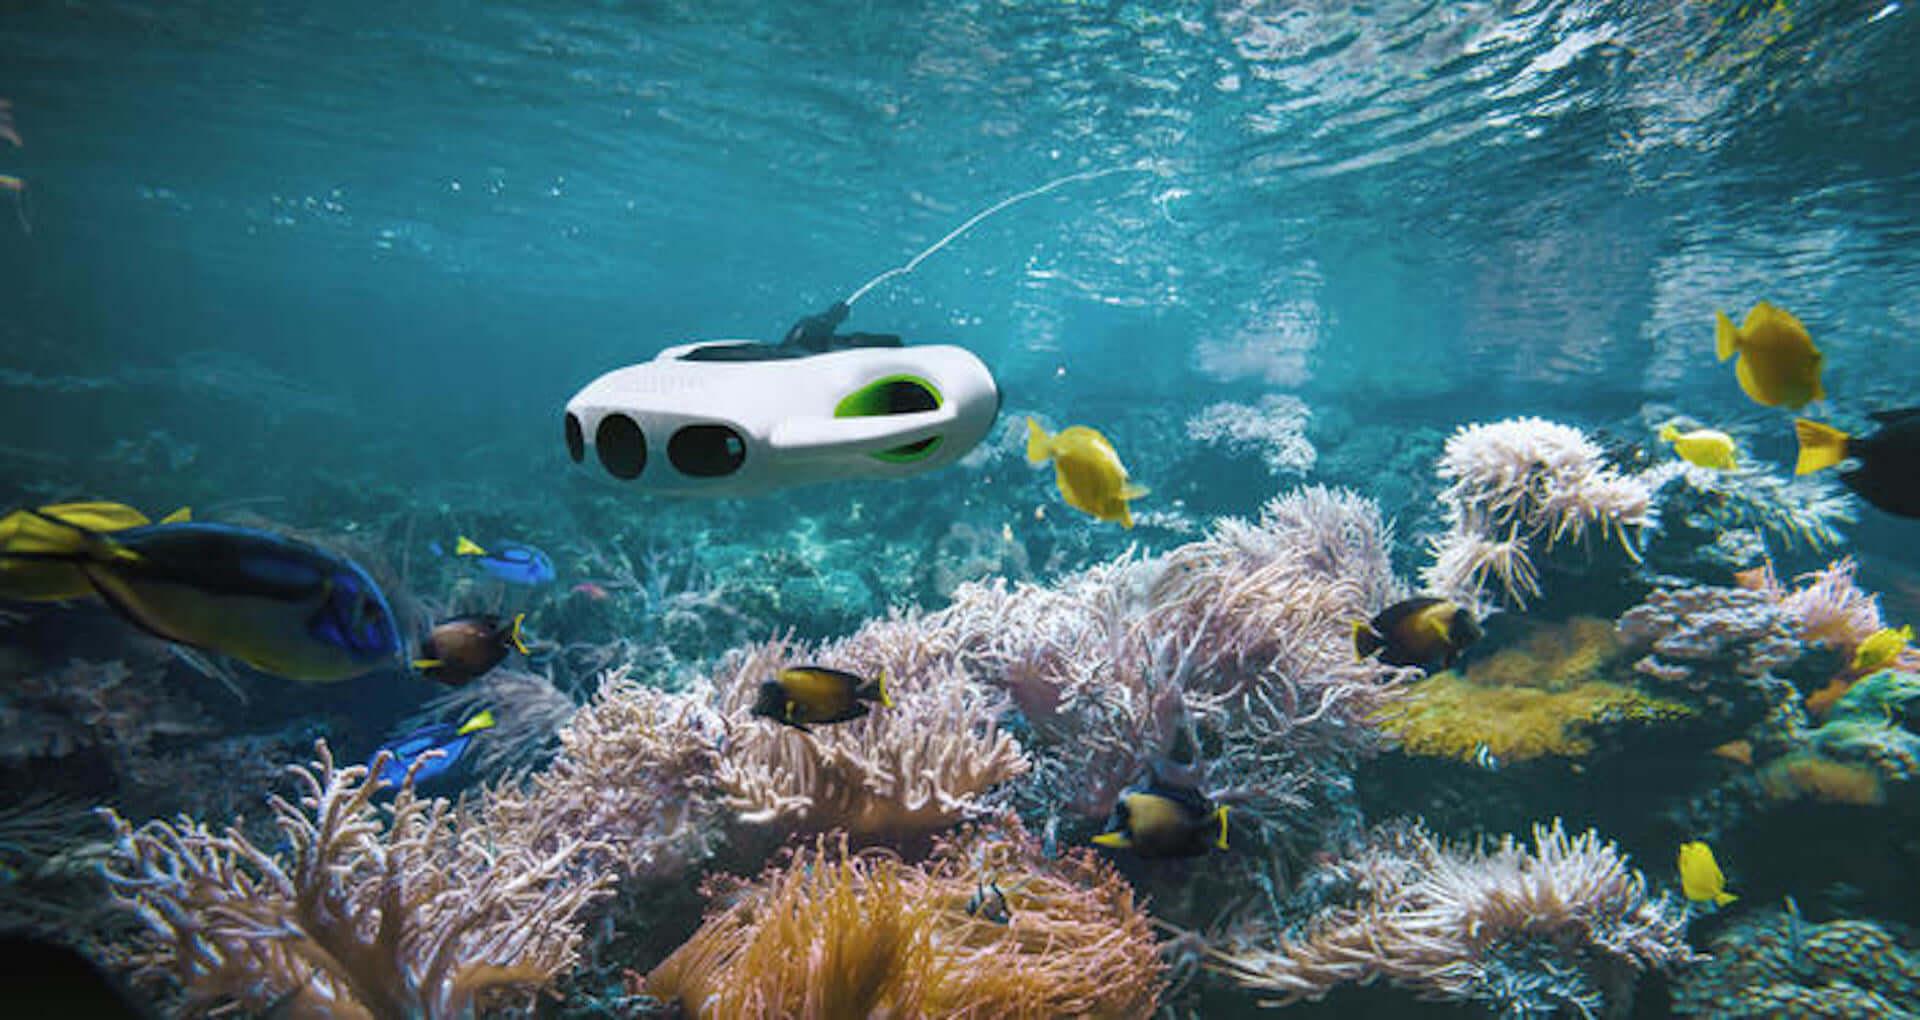 4Kカメラ&130度広角レンズ搭載の水中ドローン『BW Space Pro』がクラウドファンディングにて販売開始! tech200420_youcan_robot_3-1920x1020